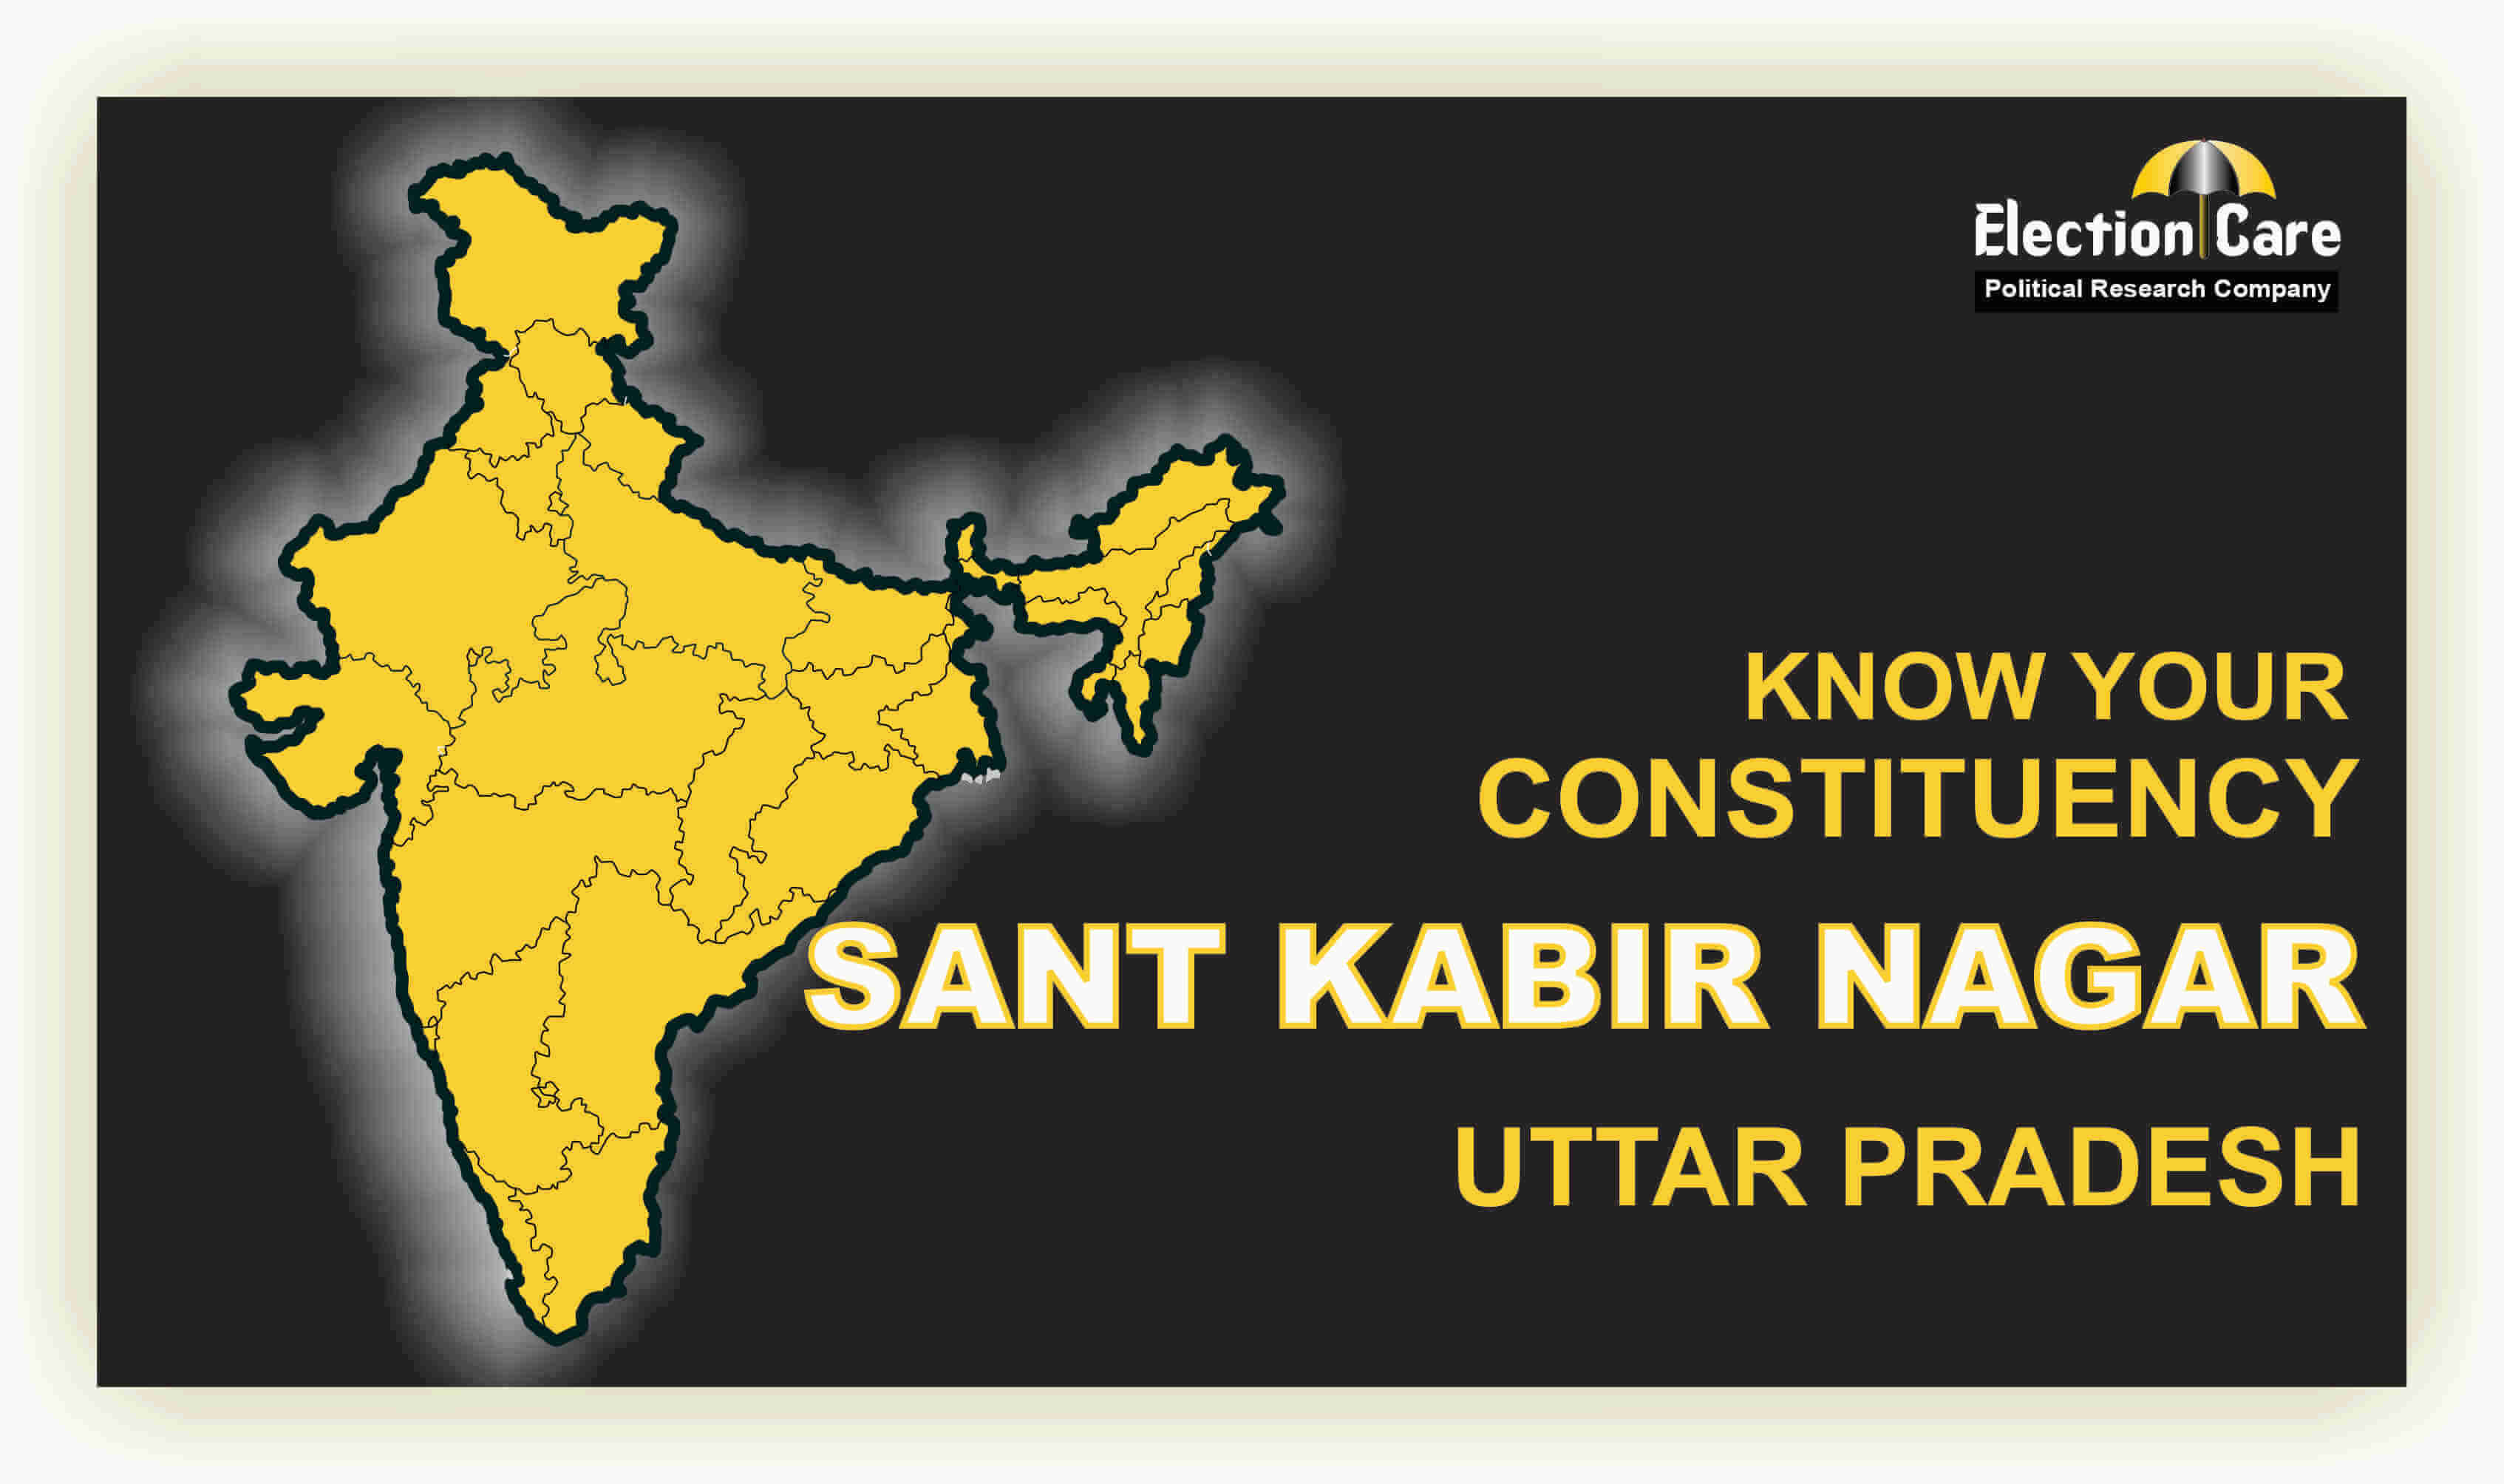 Sant Kabir Nagar Parliament Election Result